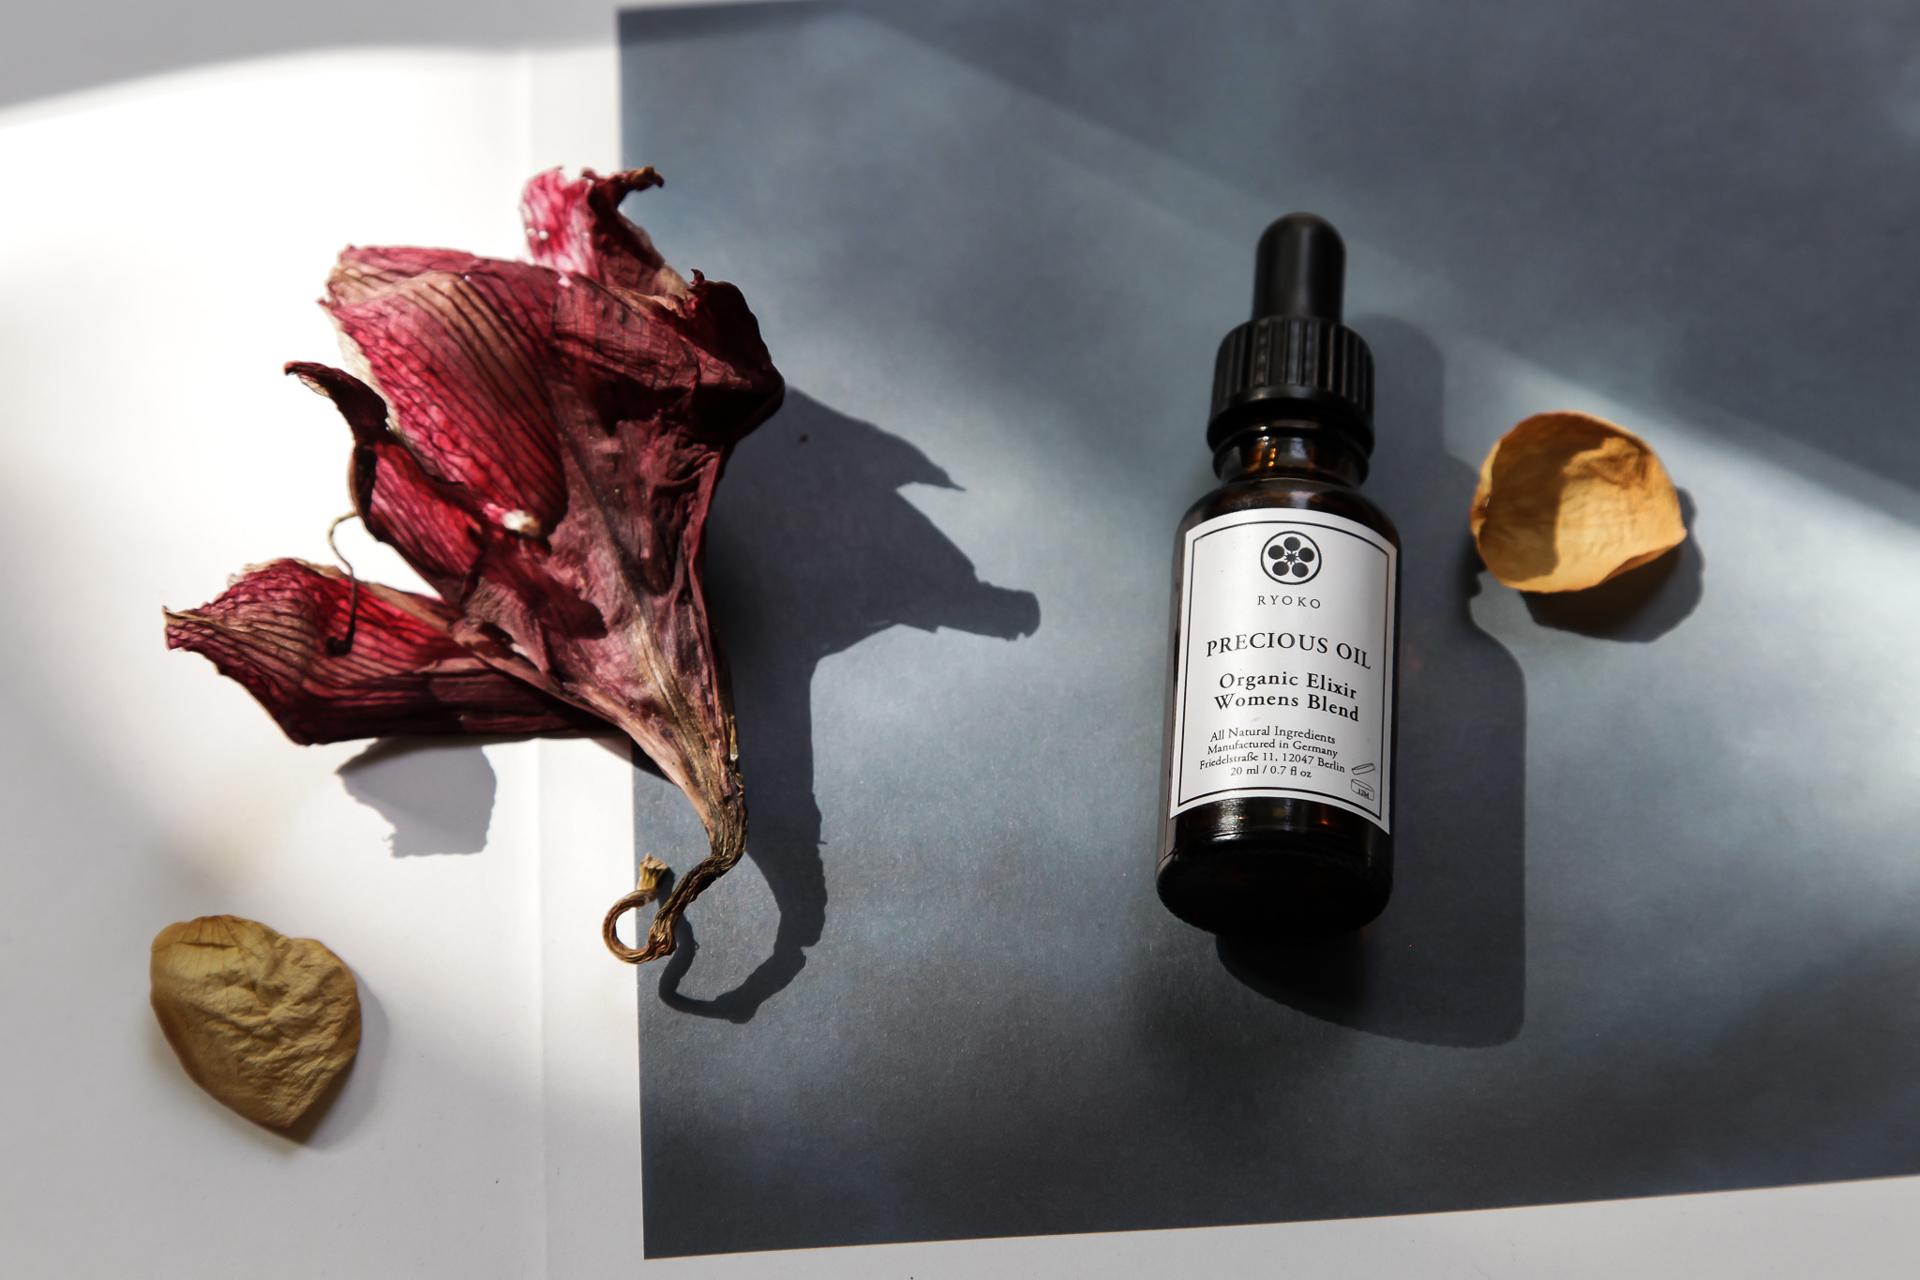 Ryoko's Precious Oil - an organic elixir women's blend